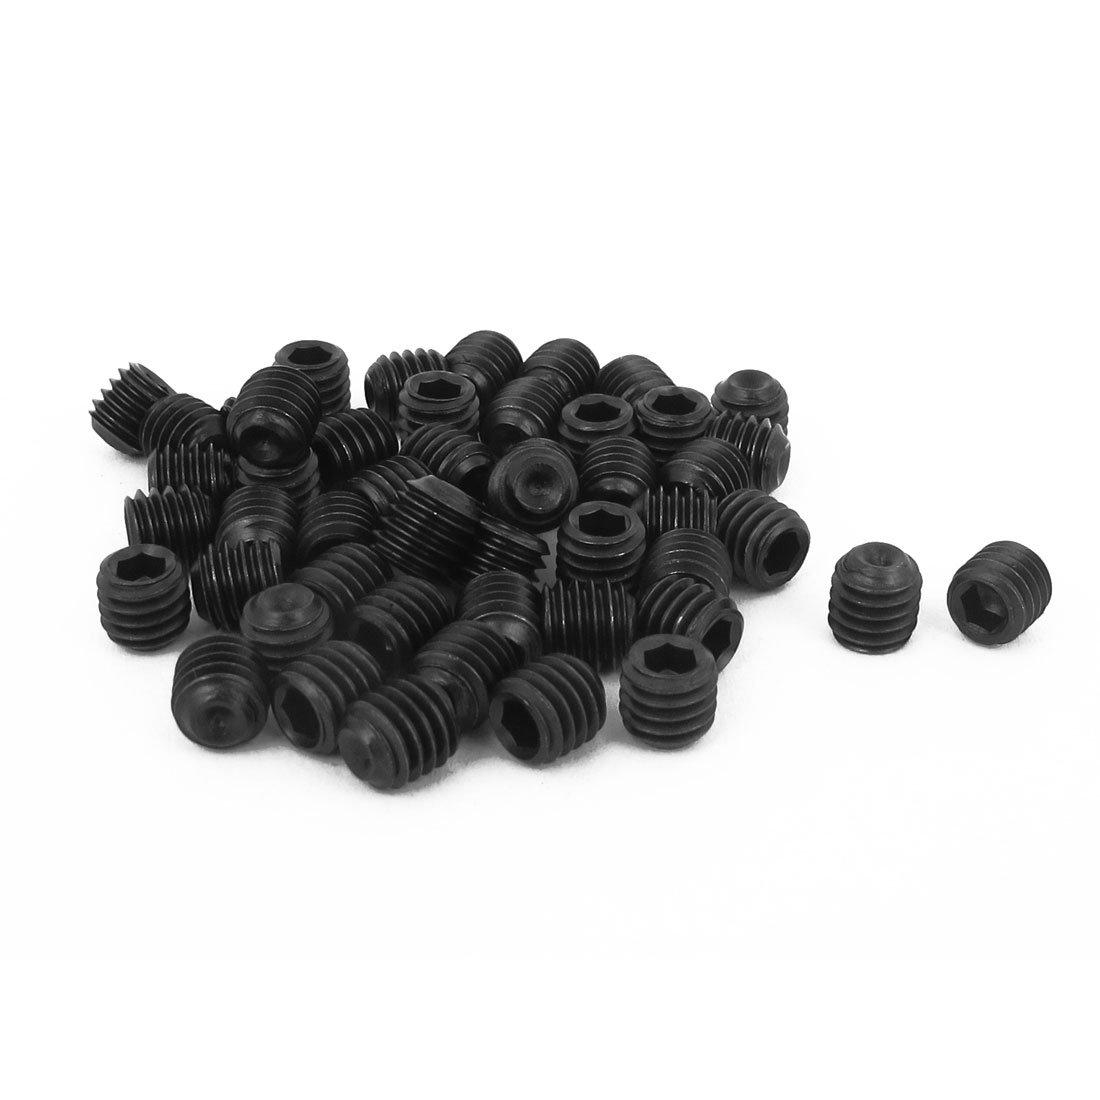 uxcell M6 x 6mm 1mm Pitch Hex Socket Set Cup Point Grub Screws Black 50pcs a15071800ux0205